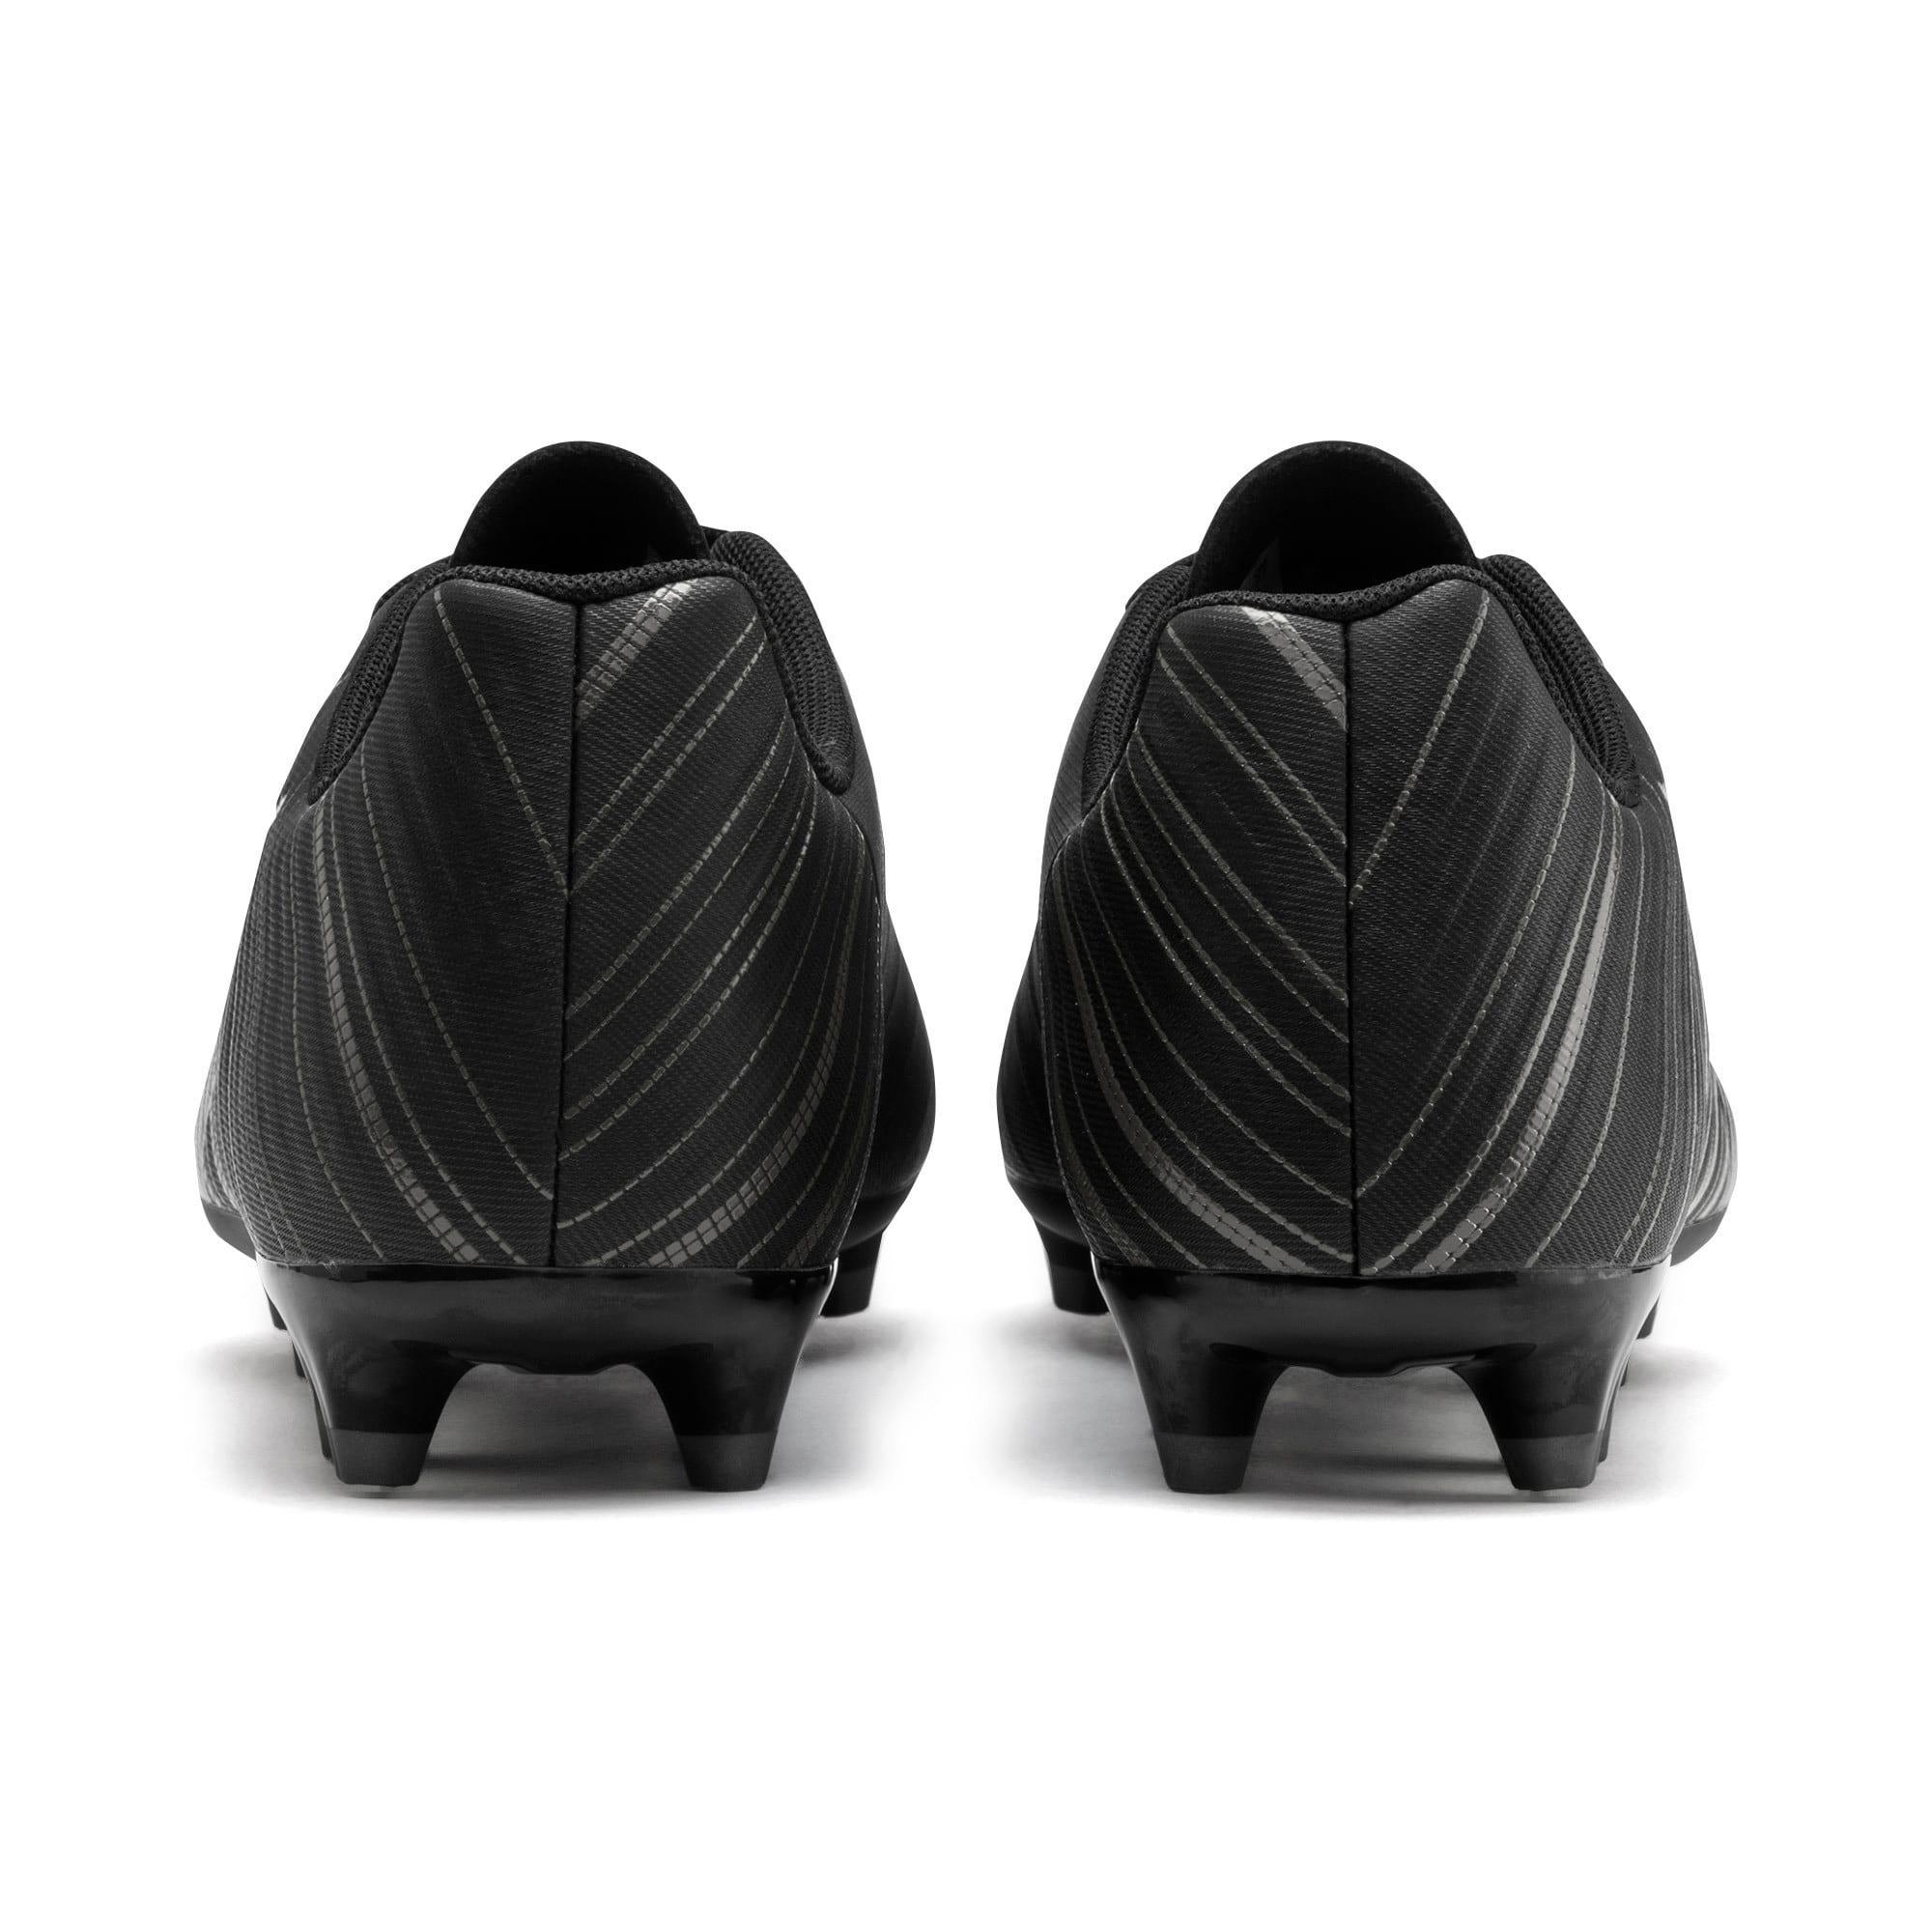 Thumbnail 4 of PUMA ONE 5.4 FG/AG Men's Soccer Cleats, Black-Black-Puma Aged Silver, medium